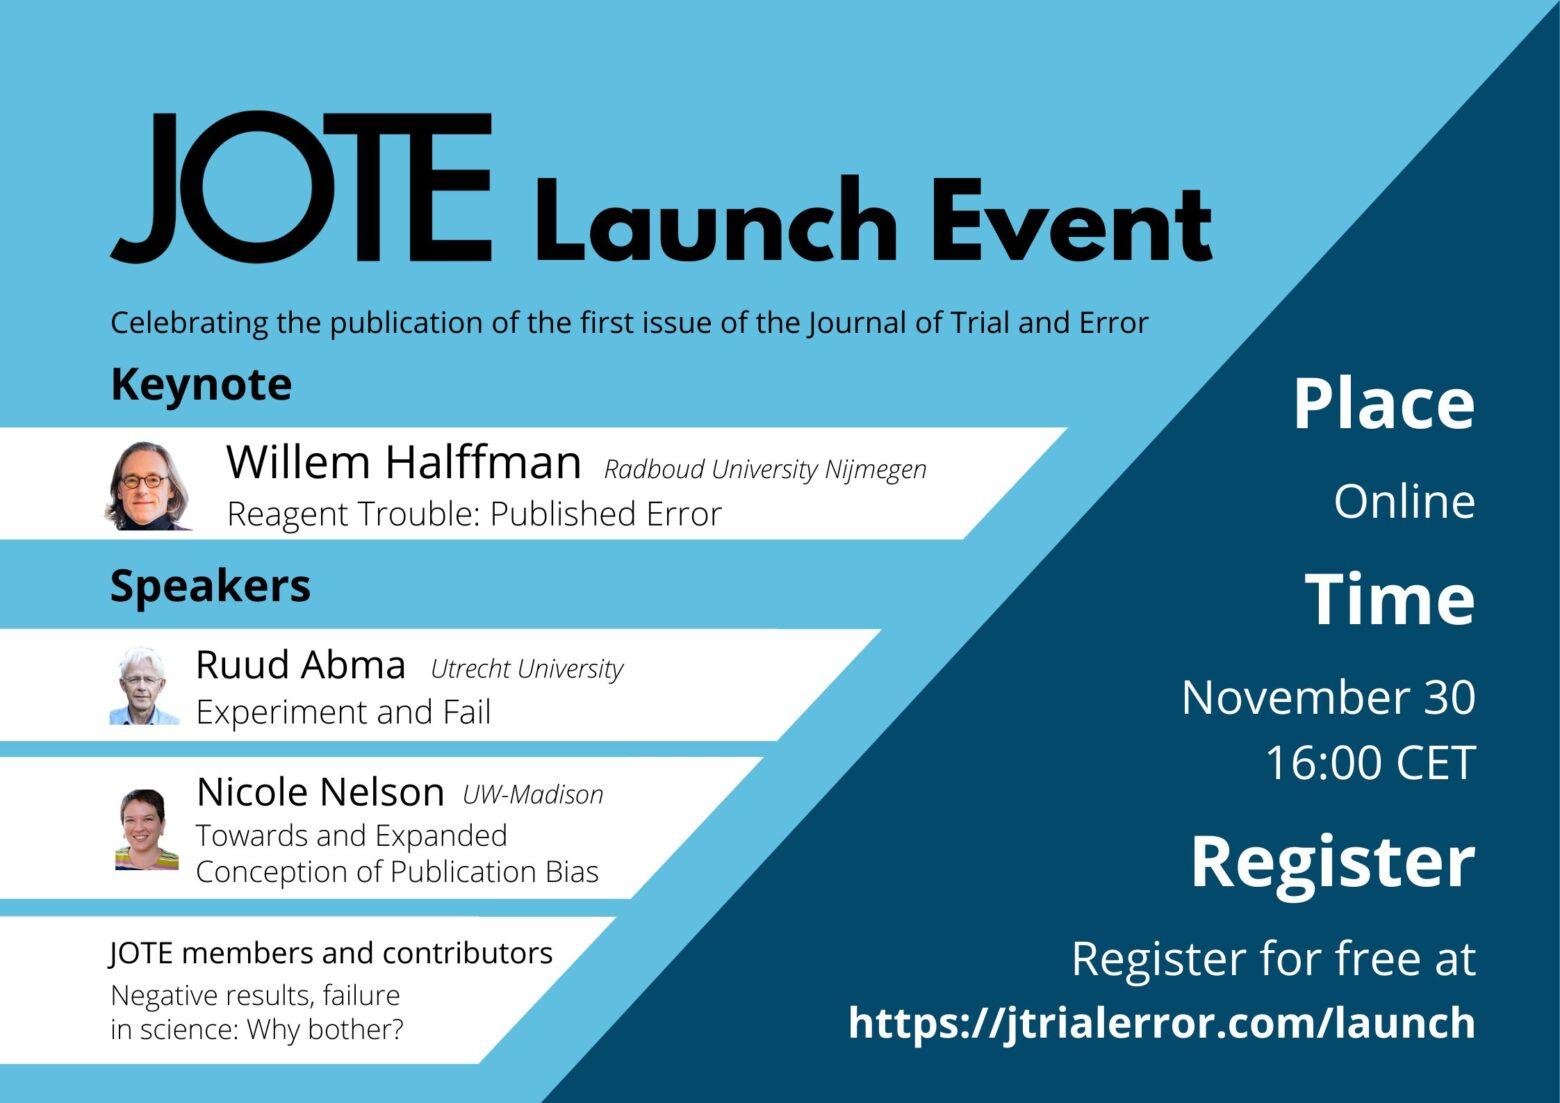 JOTE launch event, Nov 2020